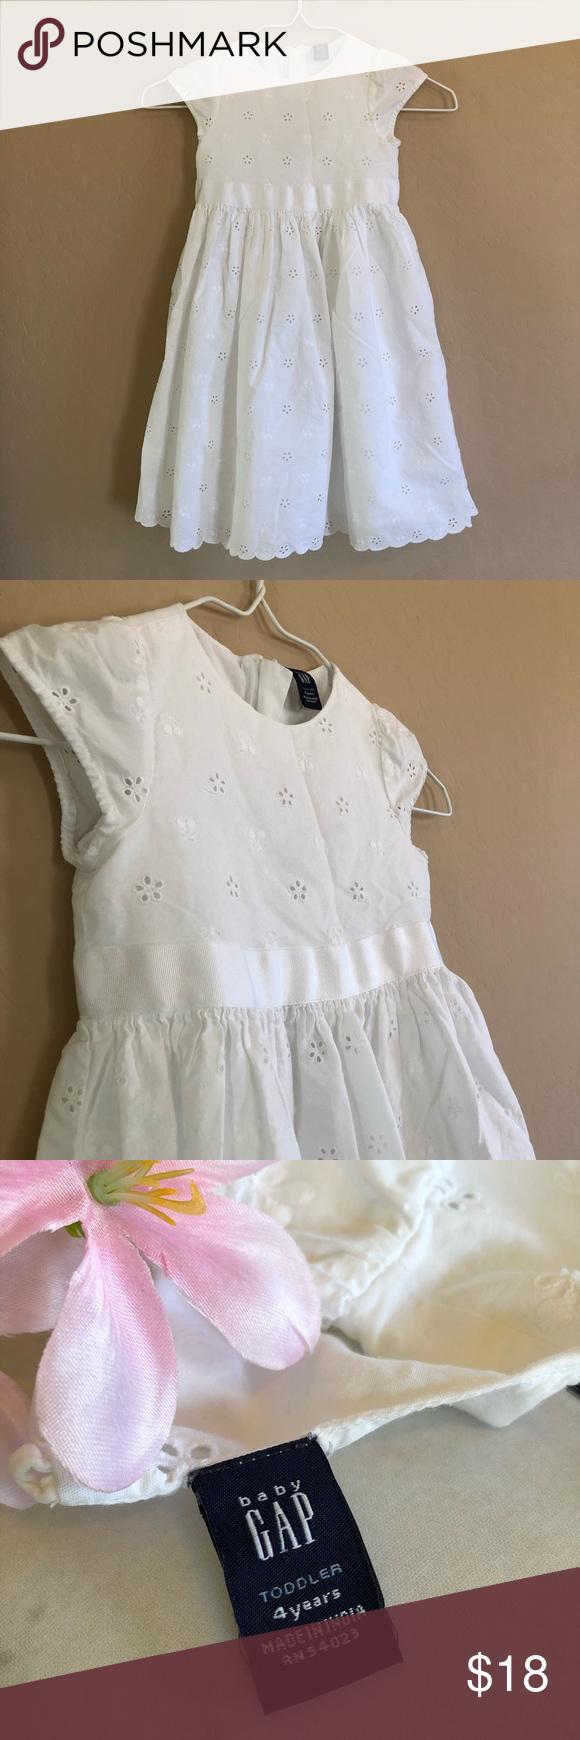 Baby Gap Dress White Eyelet Pattern 4t Size Baby Gap Dress Gap Dress Dresses [ 1740 x 580 Pixel ]